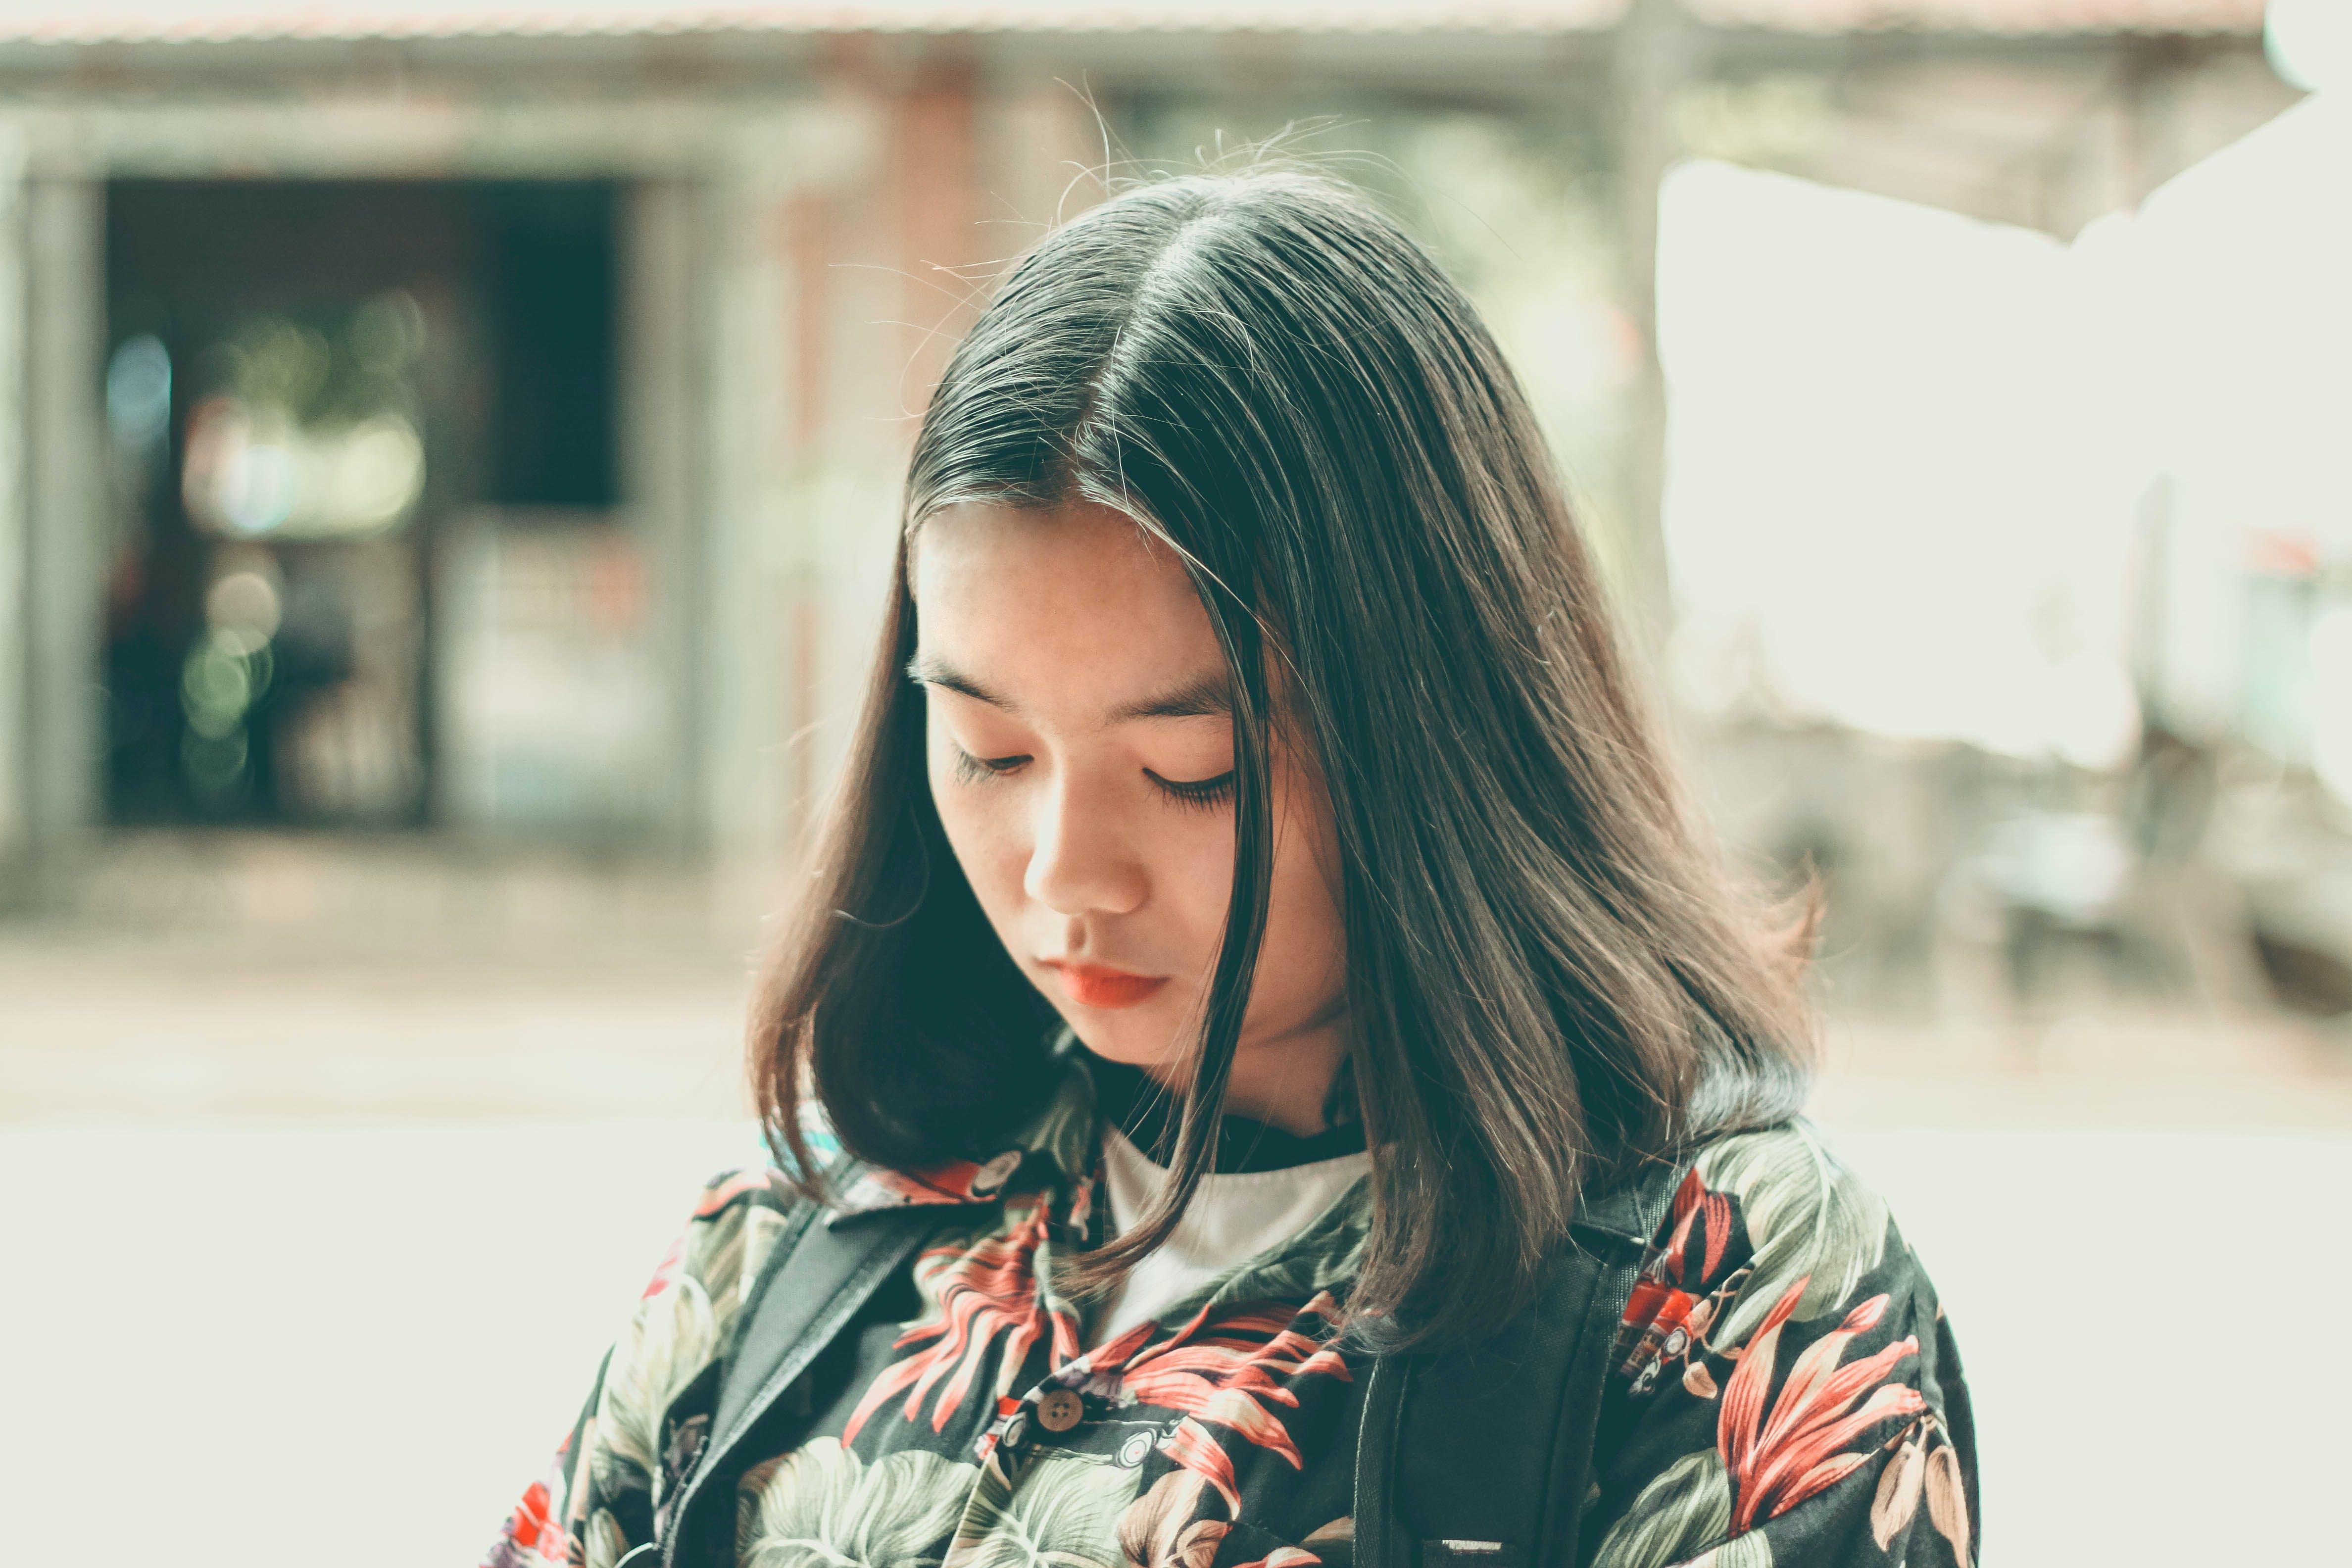 beautiful, daylight, facial expression